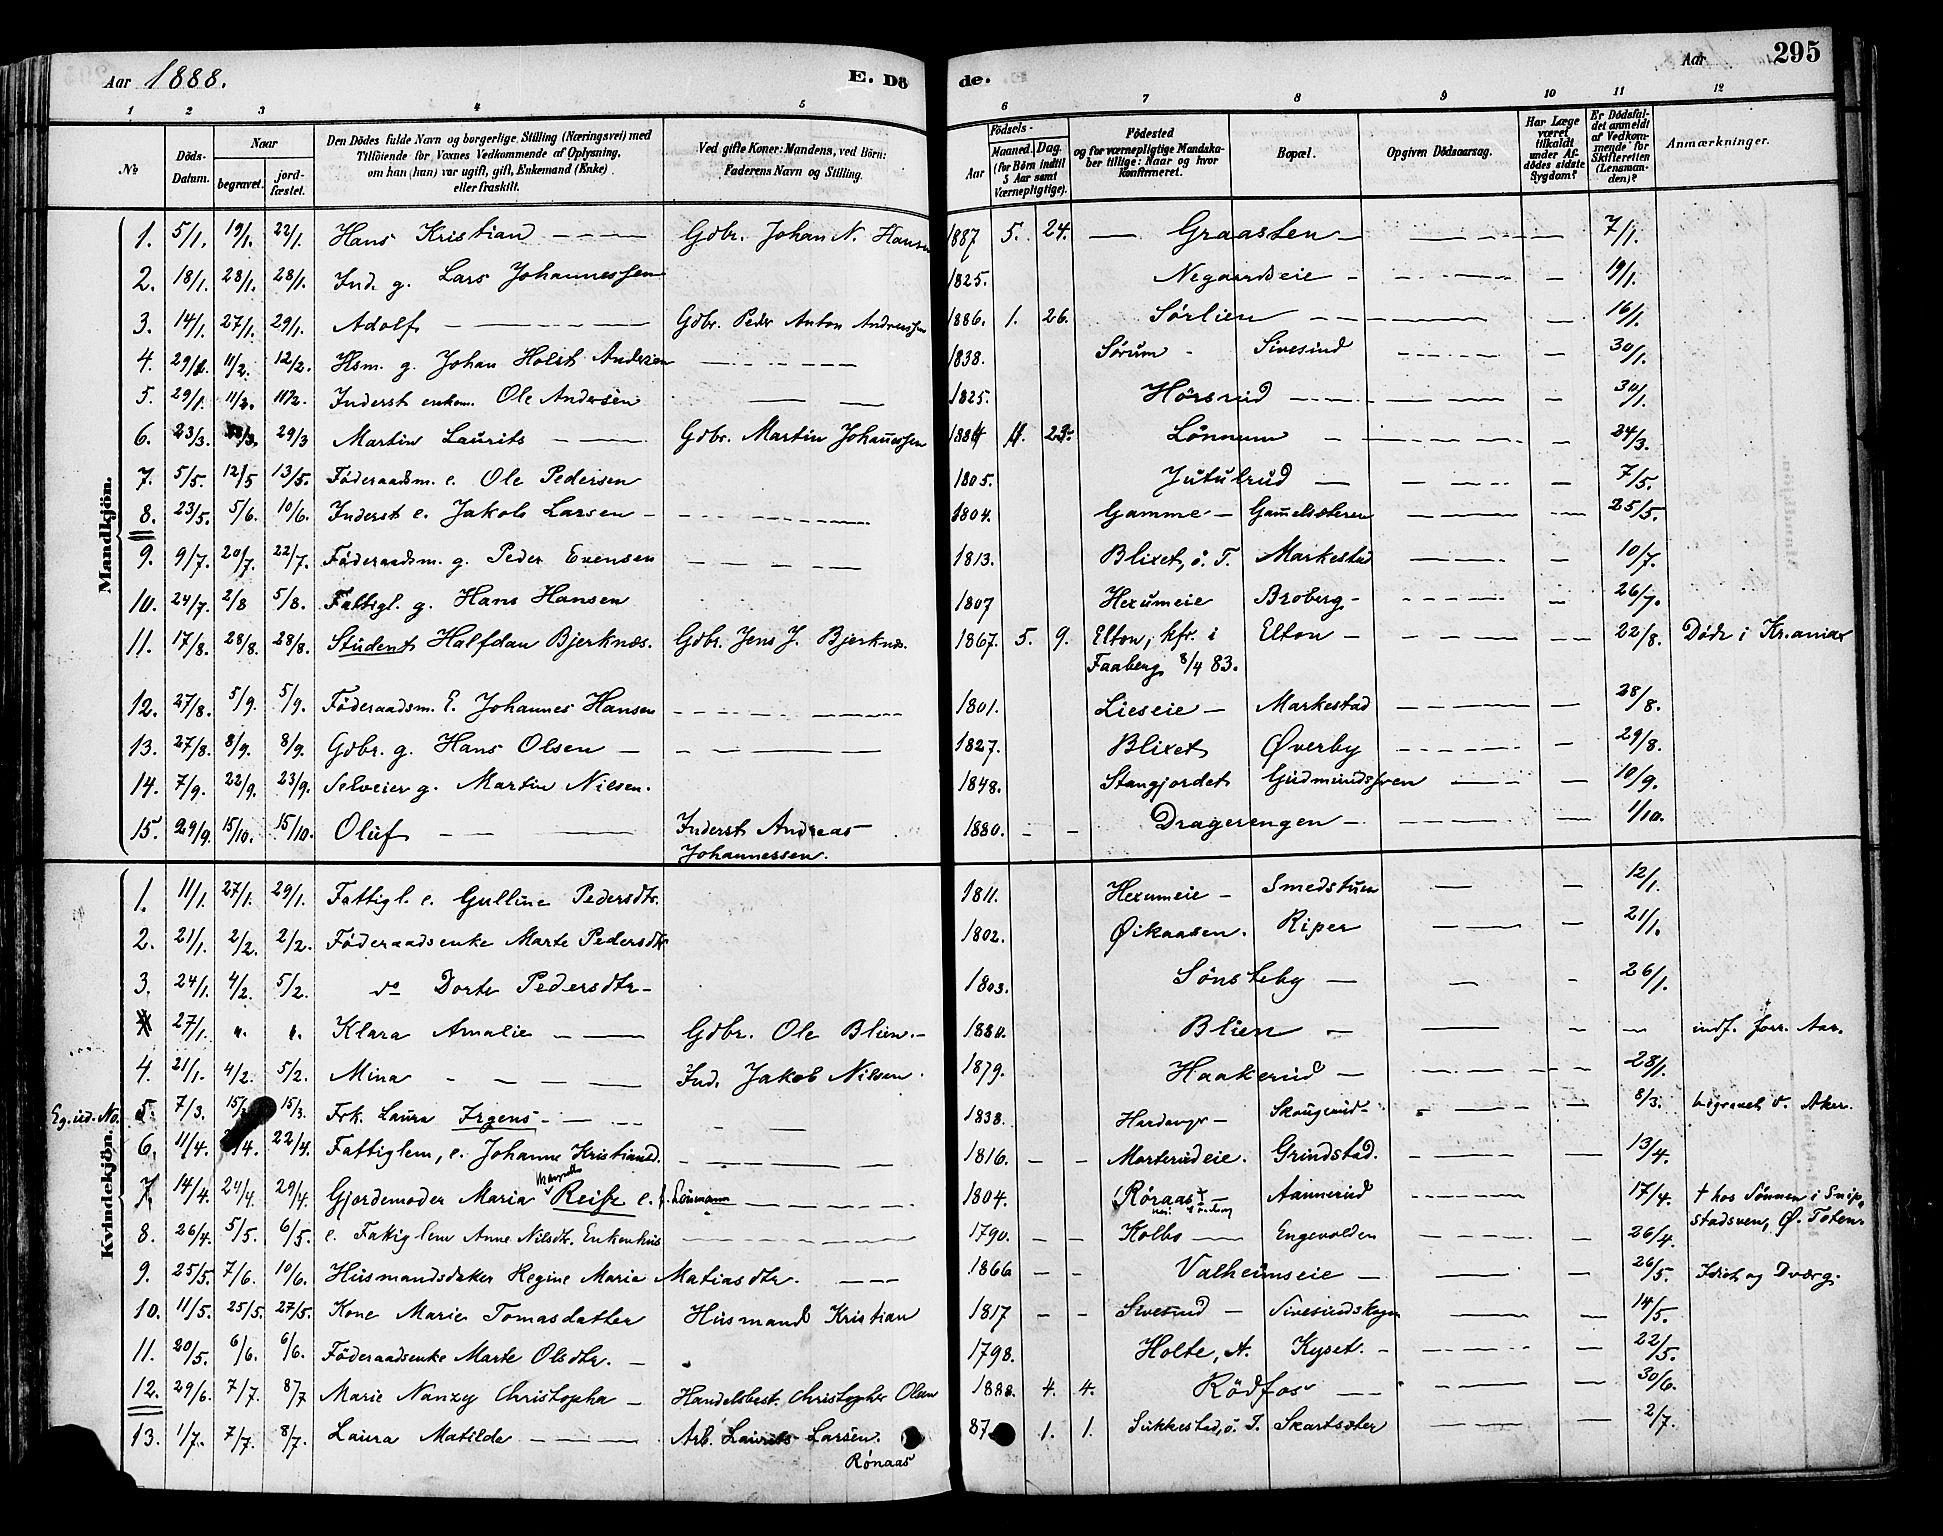 SAH, Vestre Toten prestekontor, H/Ha/Haa/L0009: Ministerialbok nr. 9, 1878-1894, s. 295